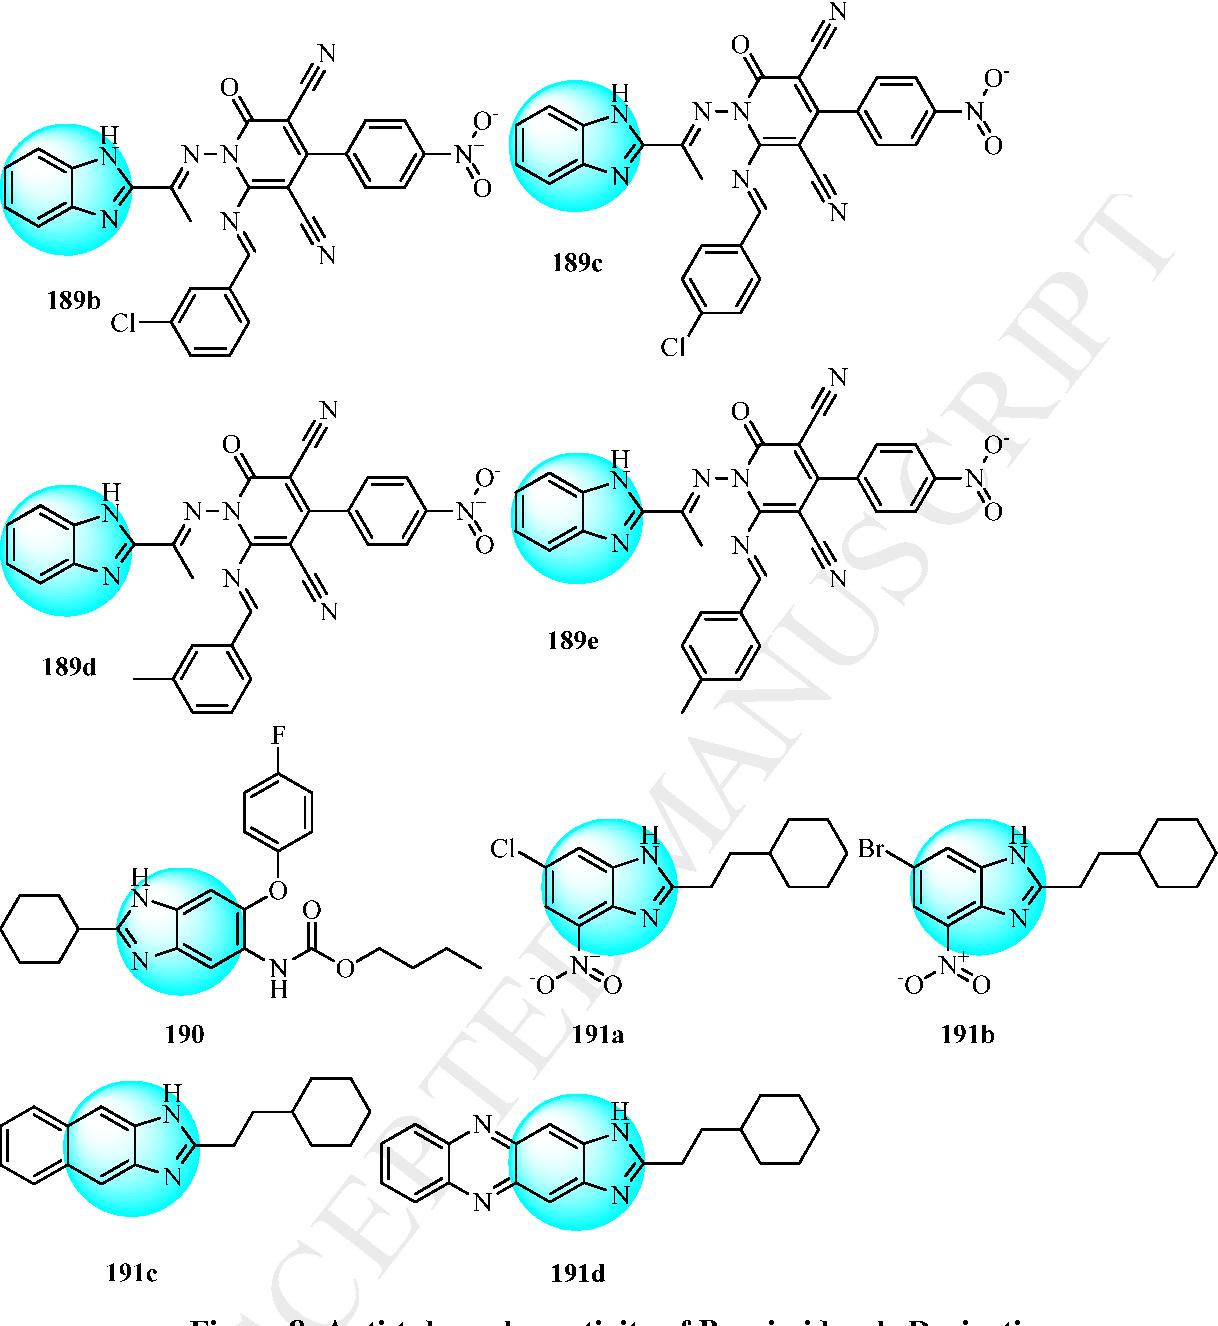 Figure 8: Anti-tubercular activity of Benzimidazole Derivatives